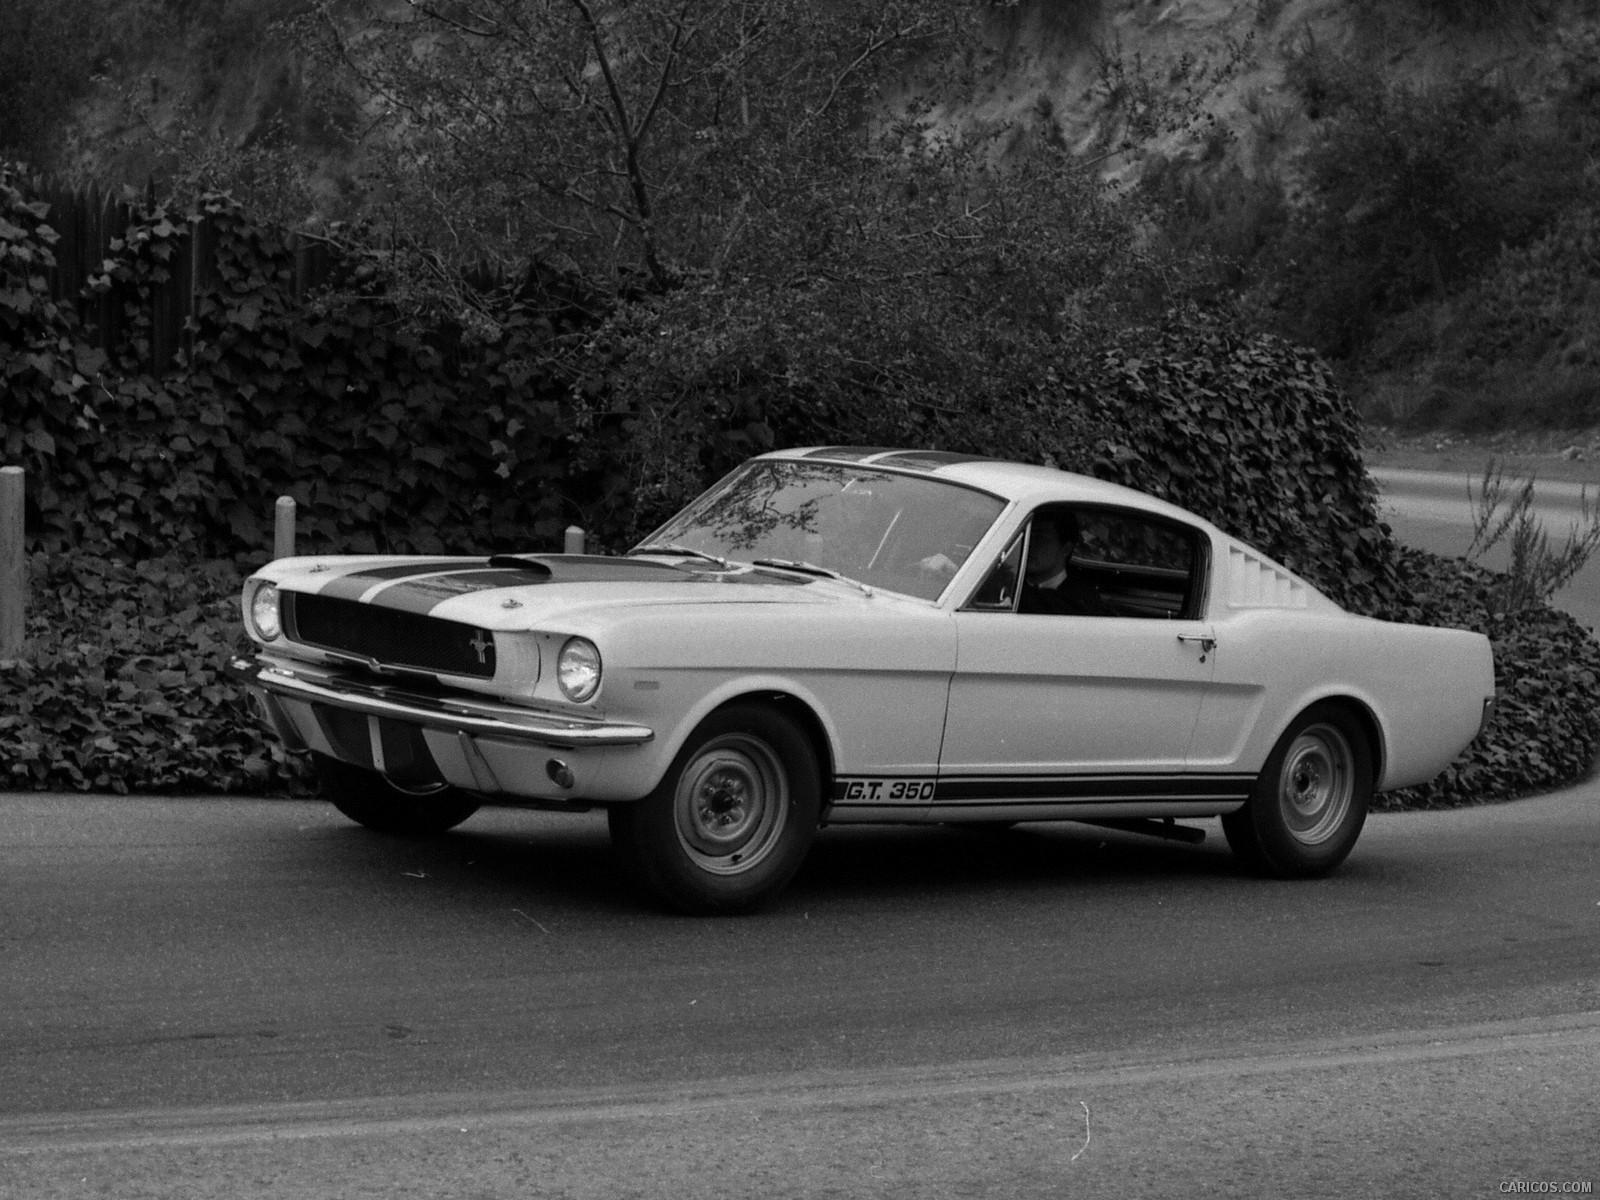 Ford Mustang Shelby GT350 1080p duvarkağıdı